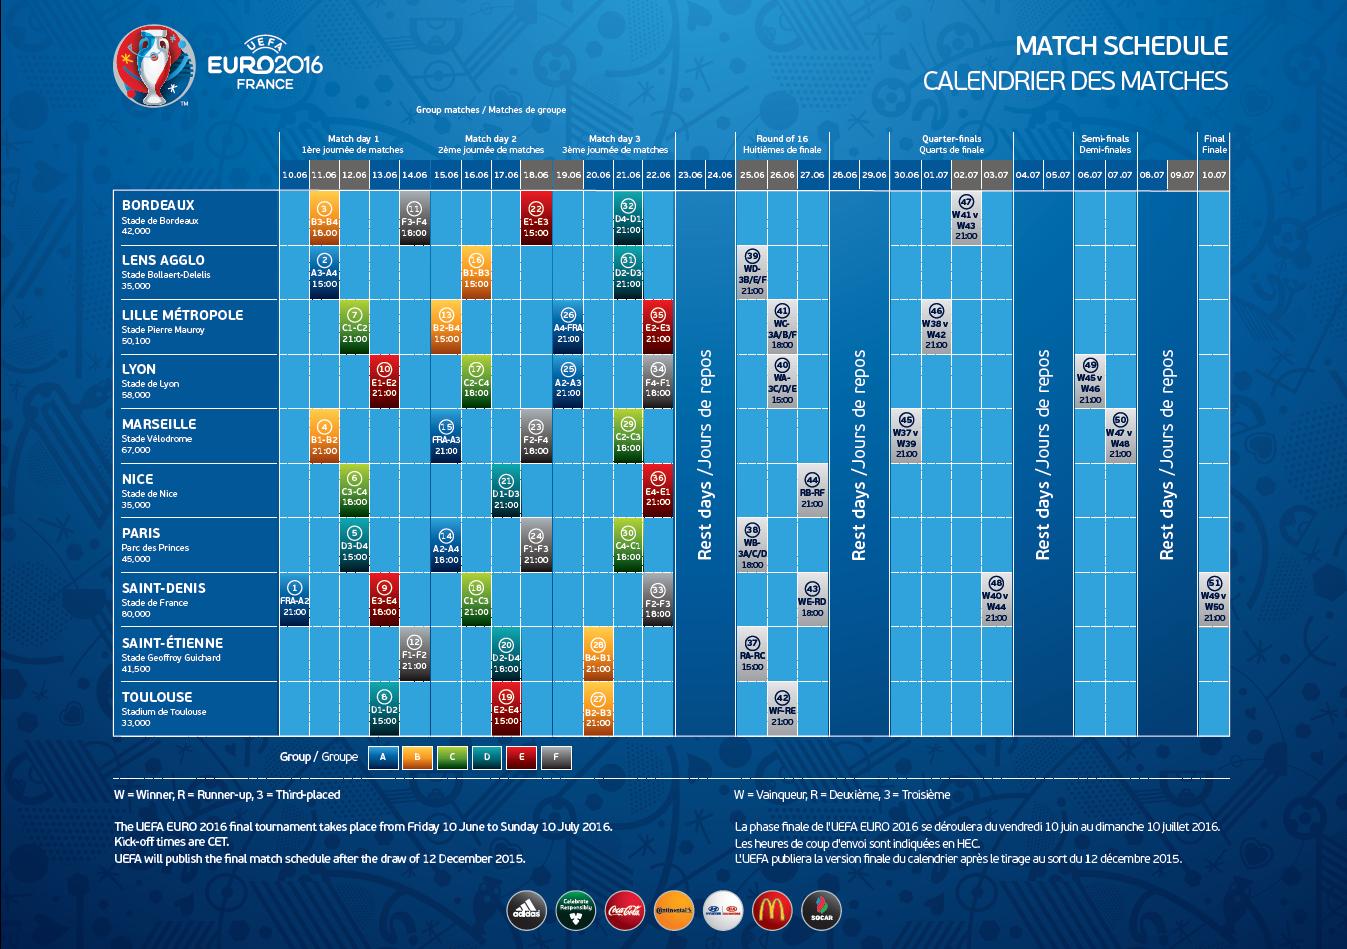 Euro 2016 Schedule, Fixtures, Timings and Venues - Footie ...